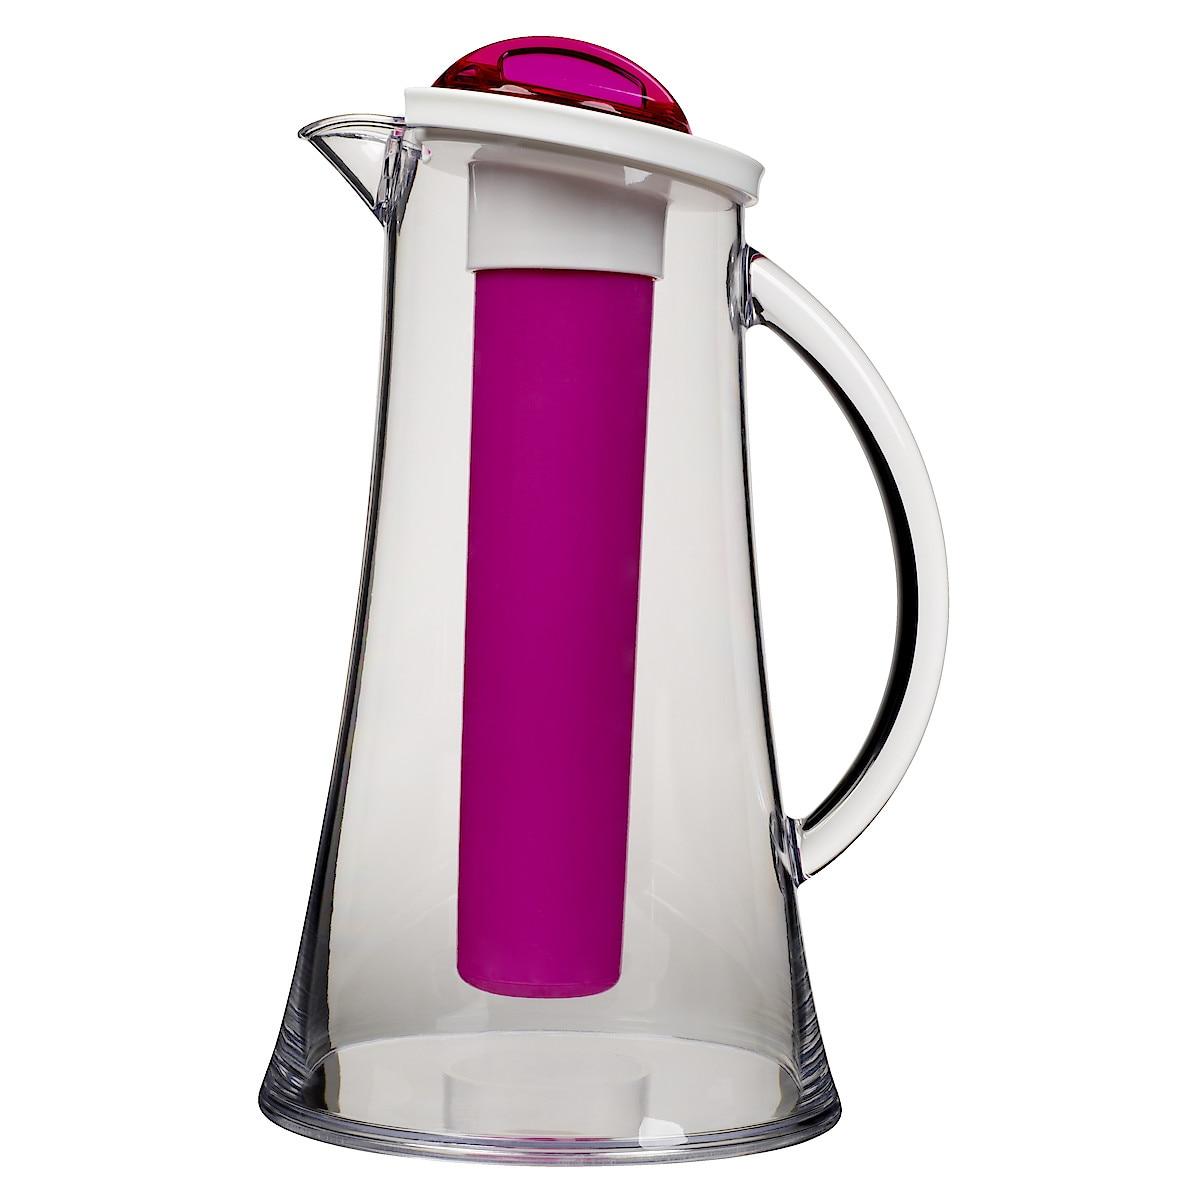 Ice core jug